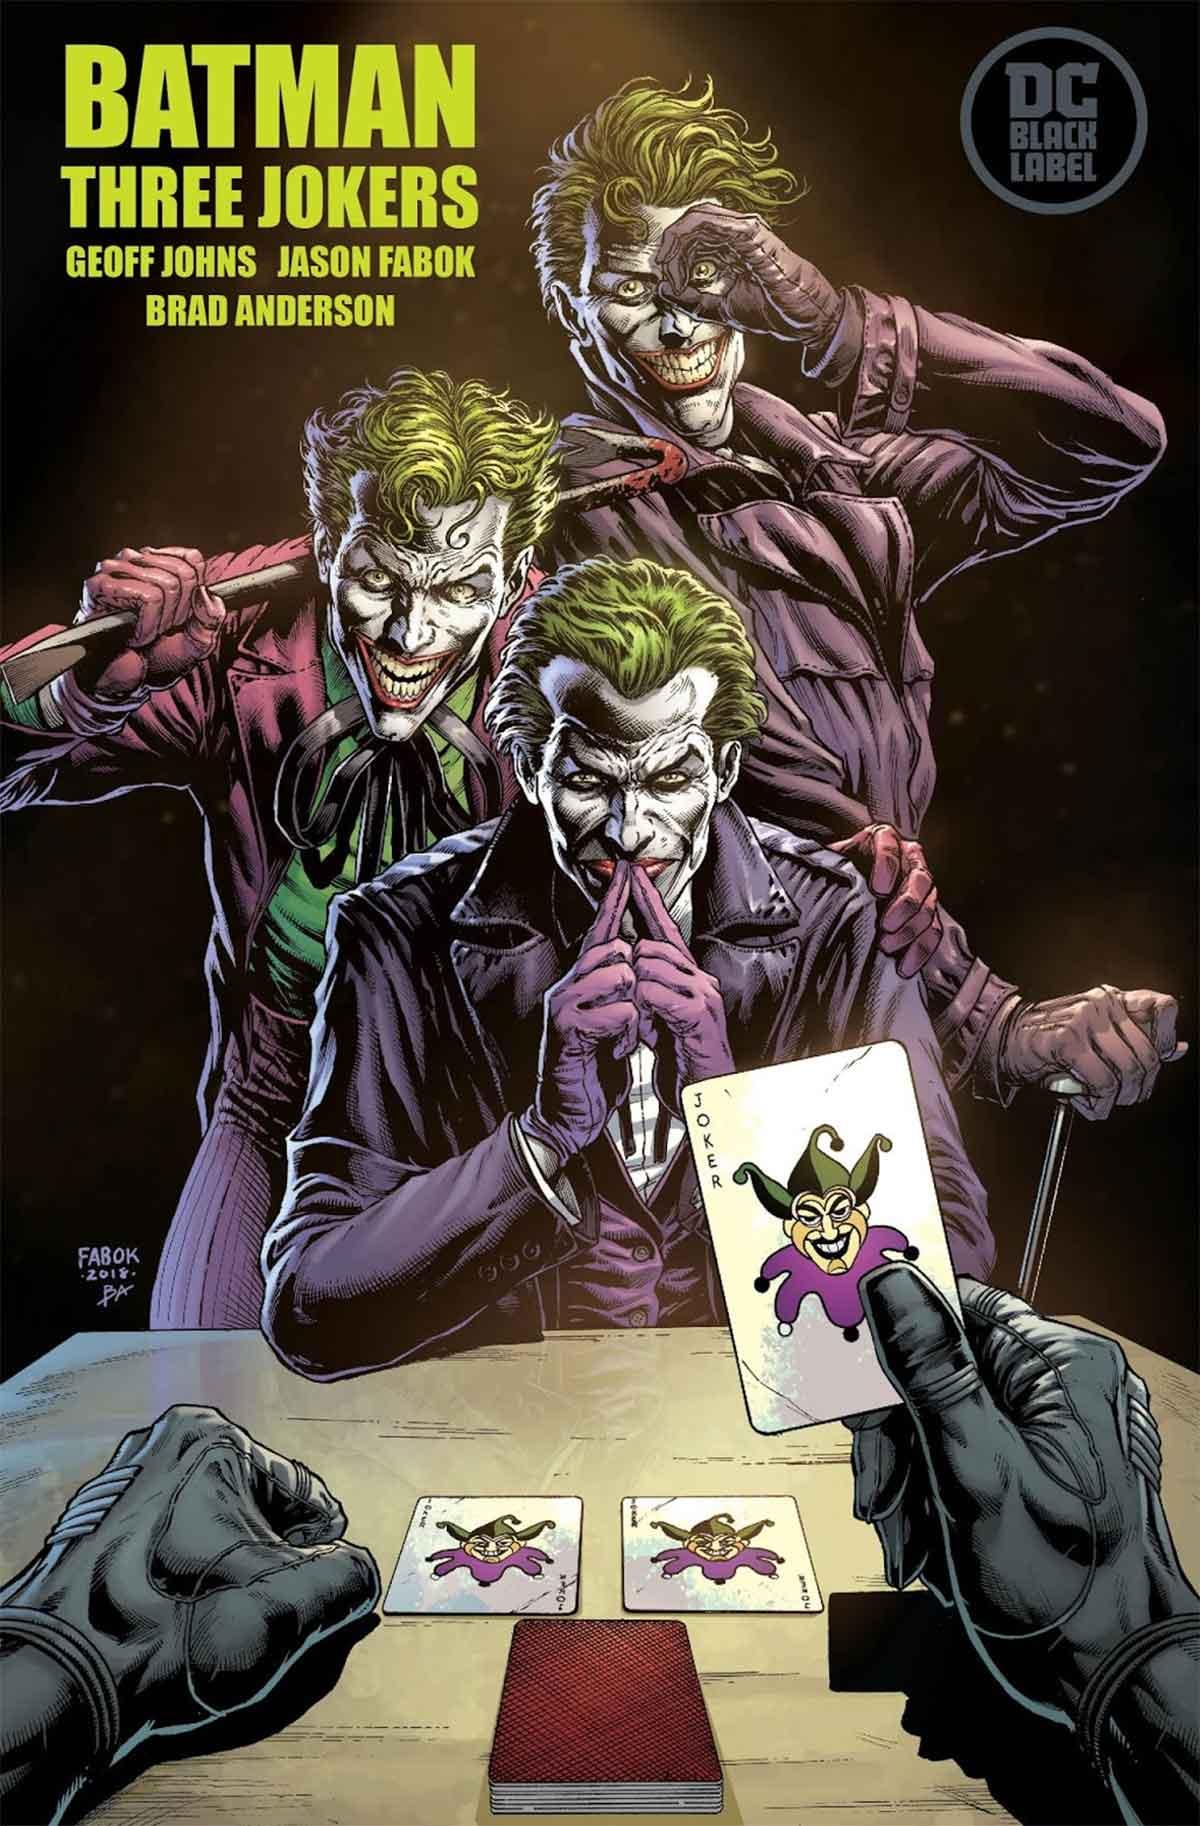 The Joker 2 movie could adapt a spectacular Batman comic